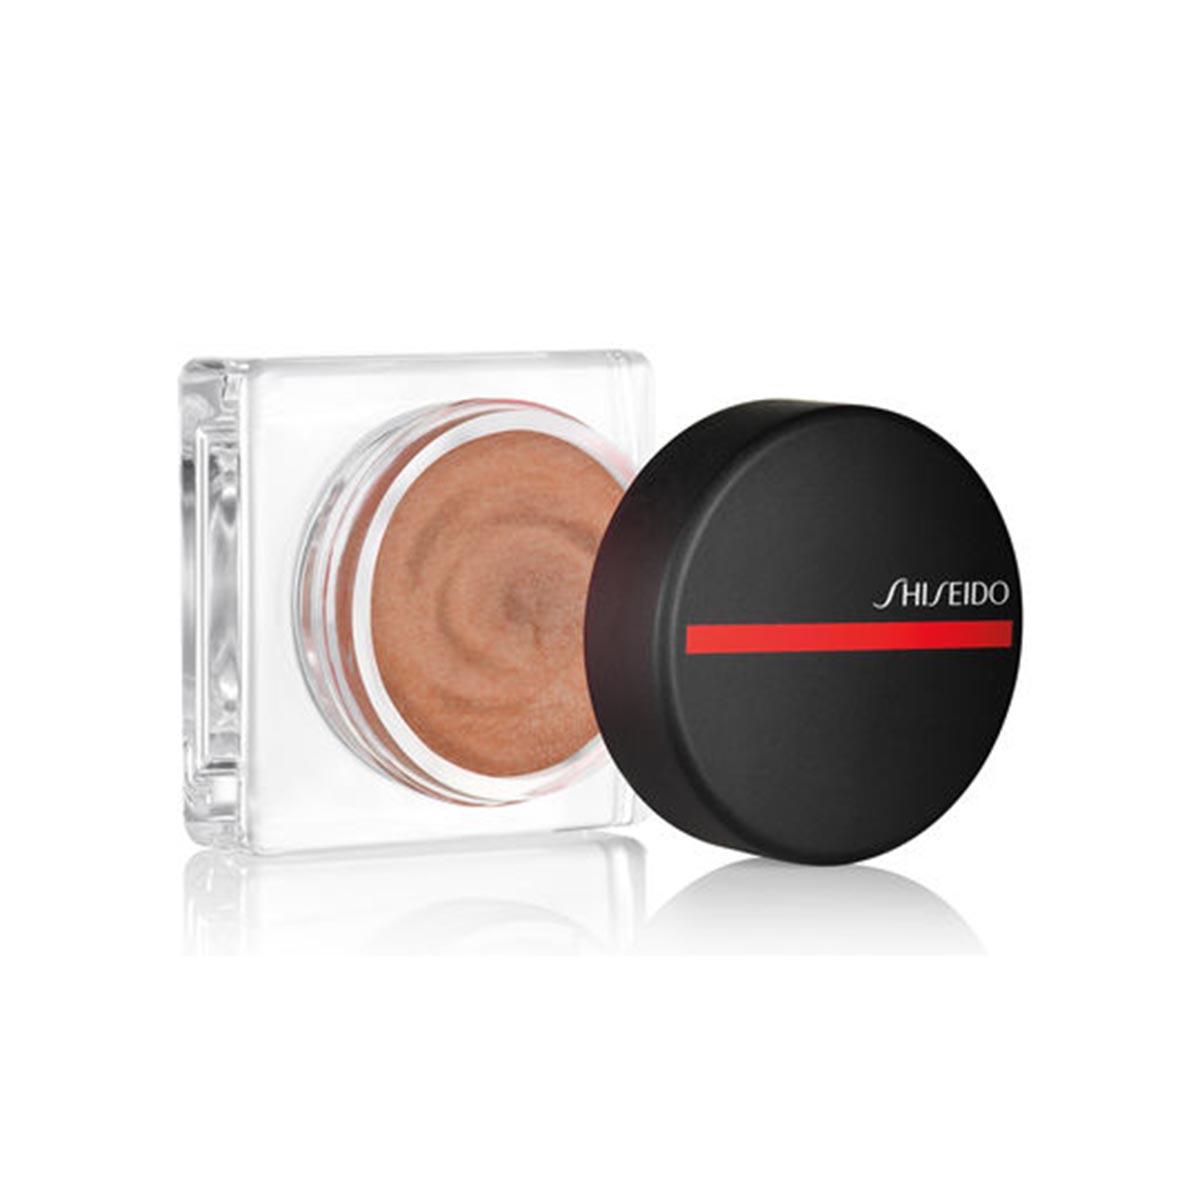 Shiseido minimalist whipped powder blush 04